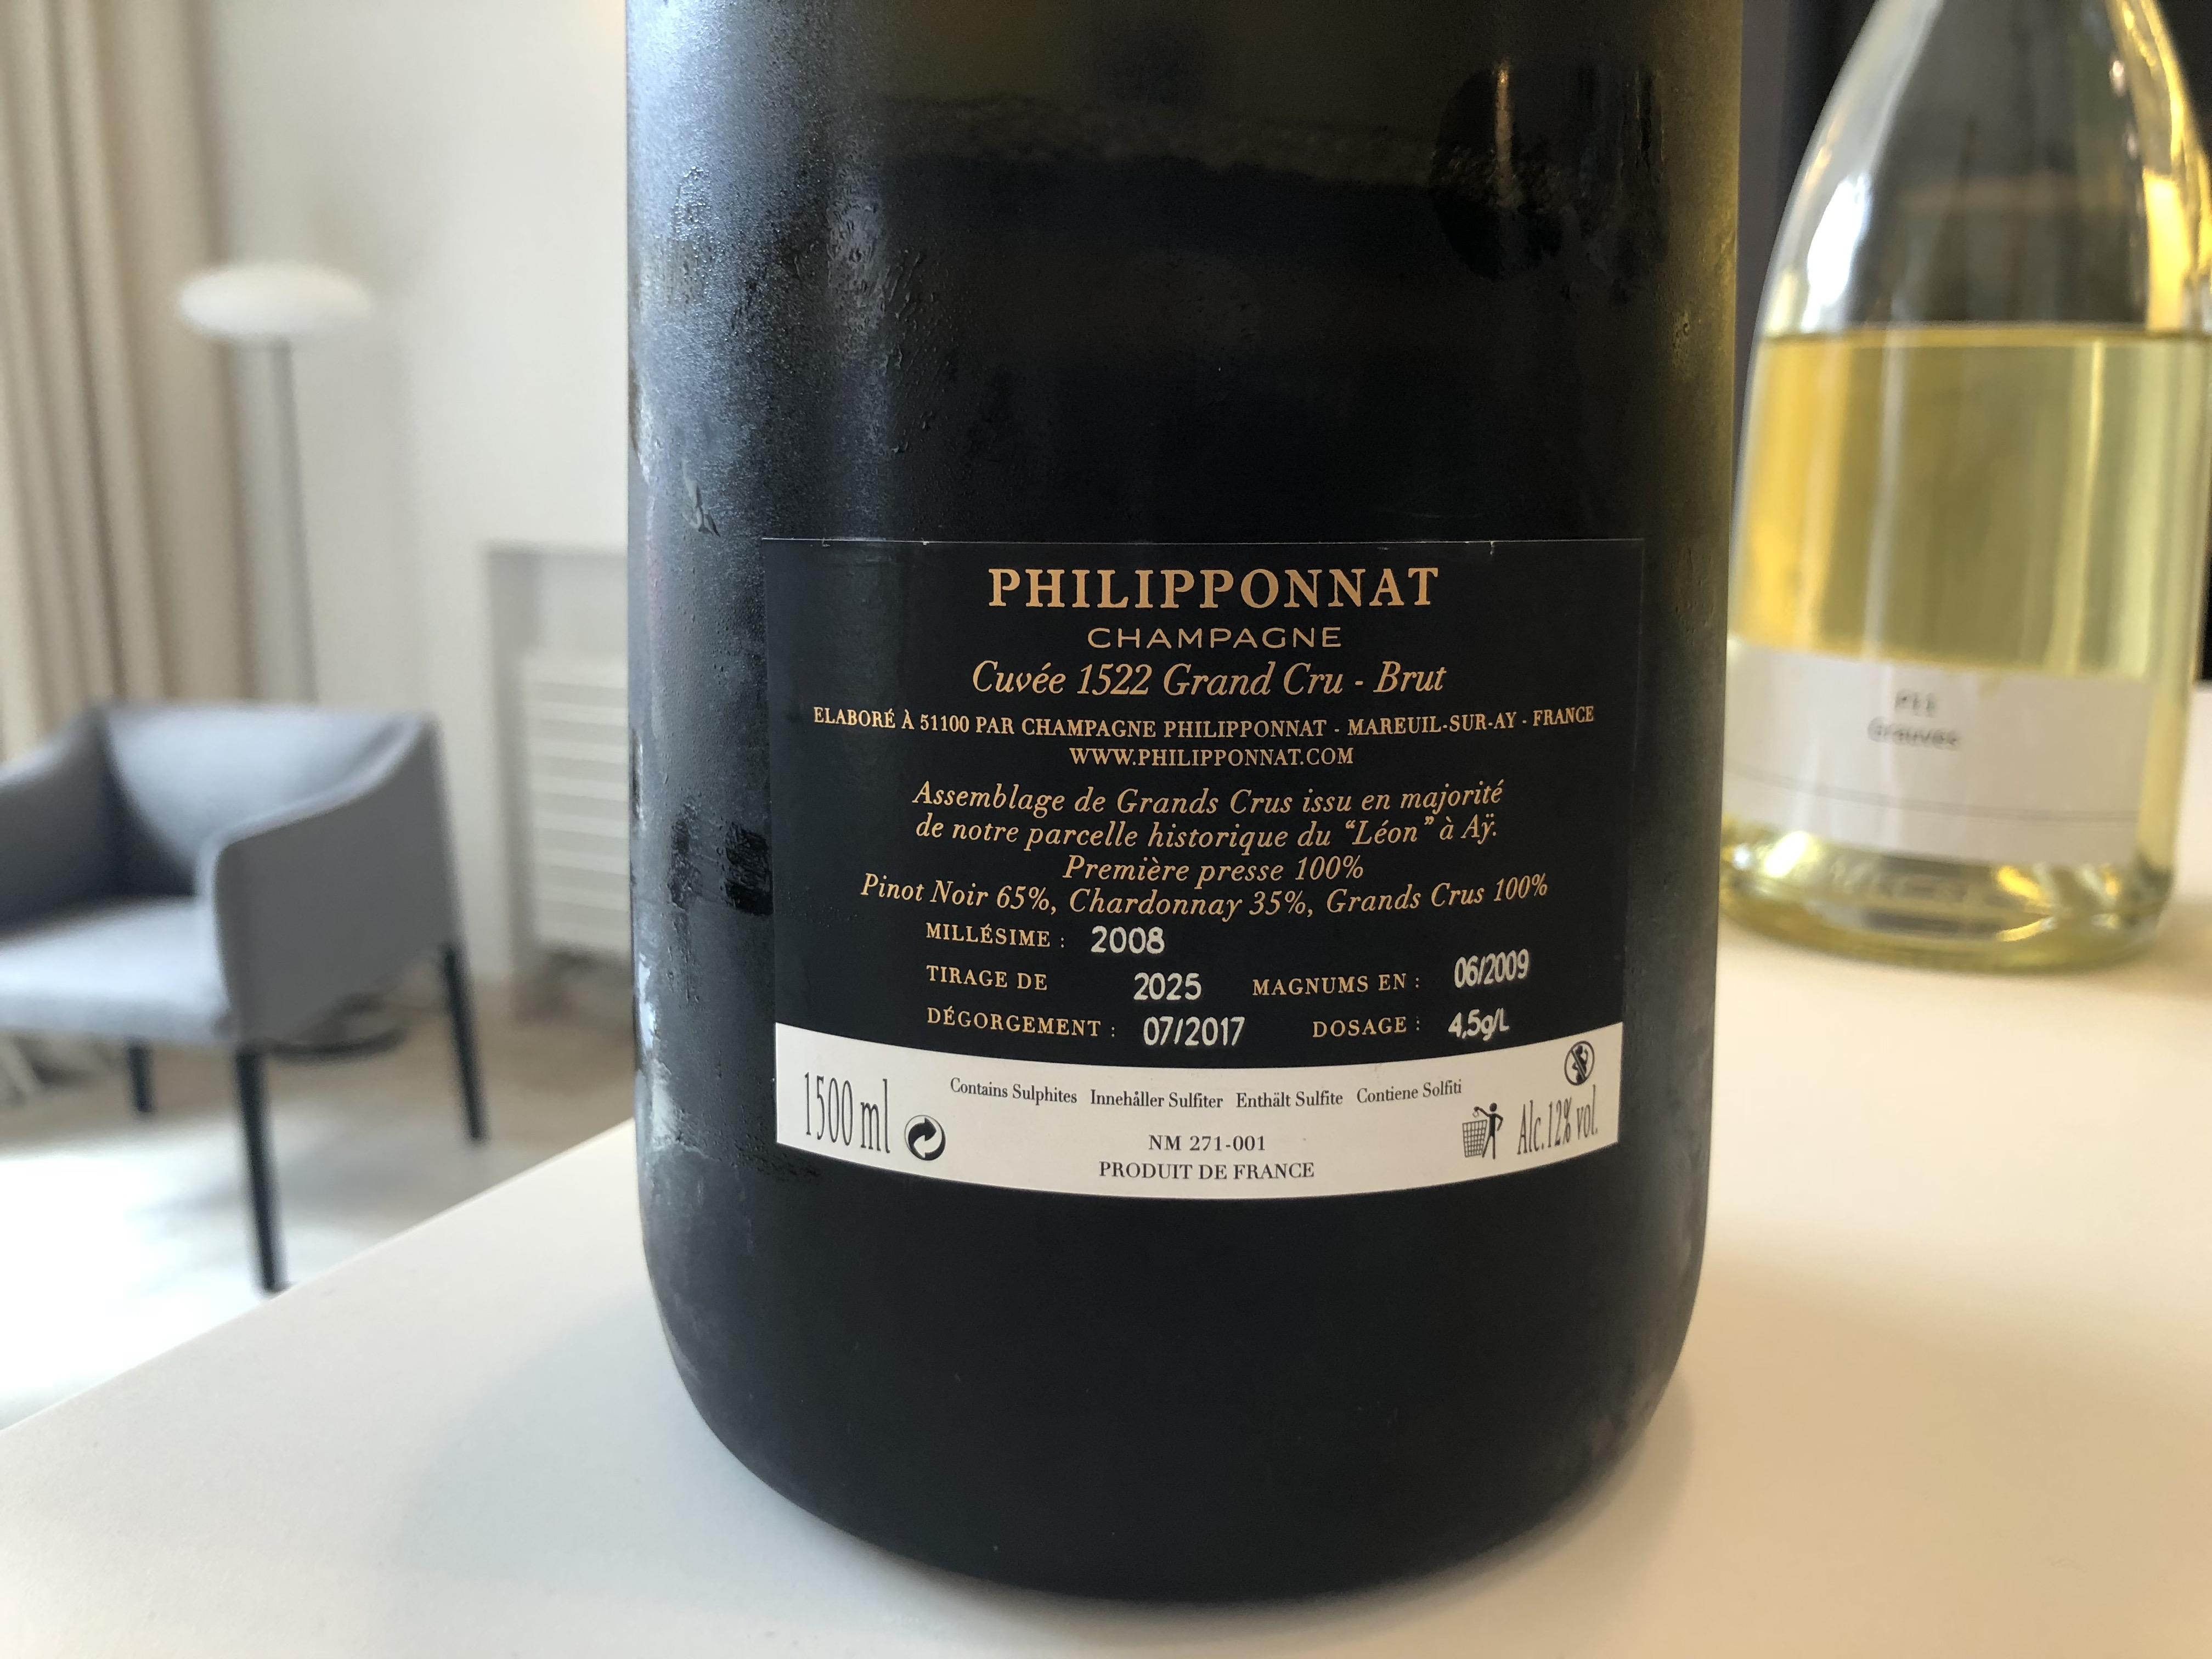 Philipponnat: 2017 Vins Clairs and new Clos des Goisses 2009